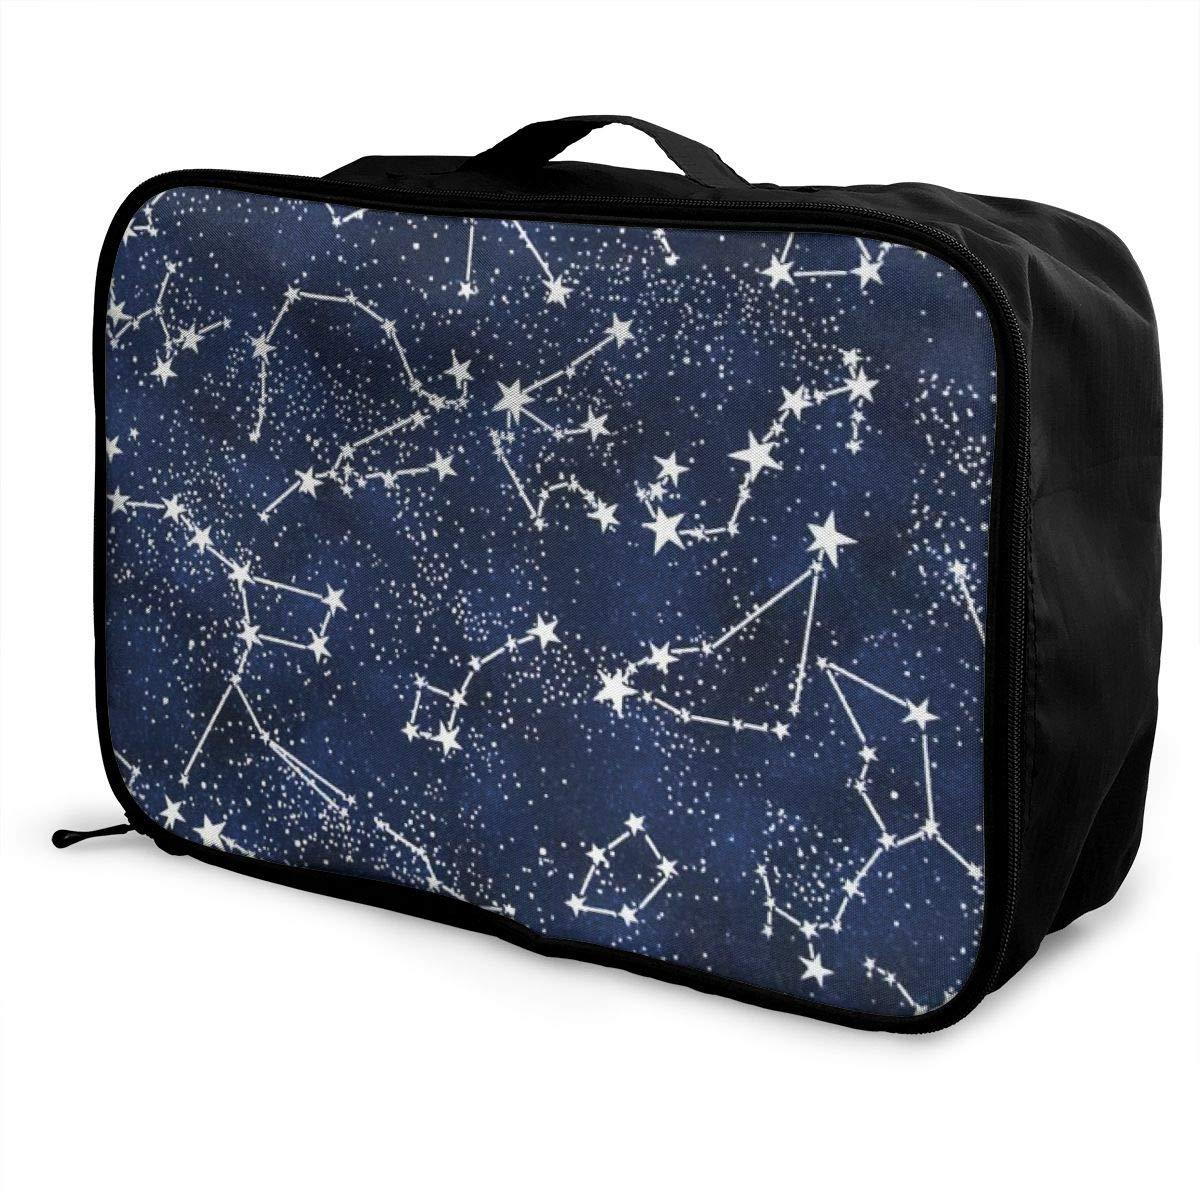 Women /& Men Foldable Travel Duffel Bag Galaxy Starry Night Stars Glow In The Dark Midnight For Luggage Gym Sports